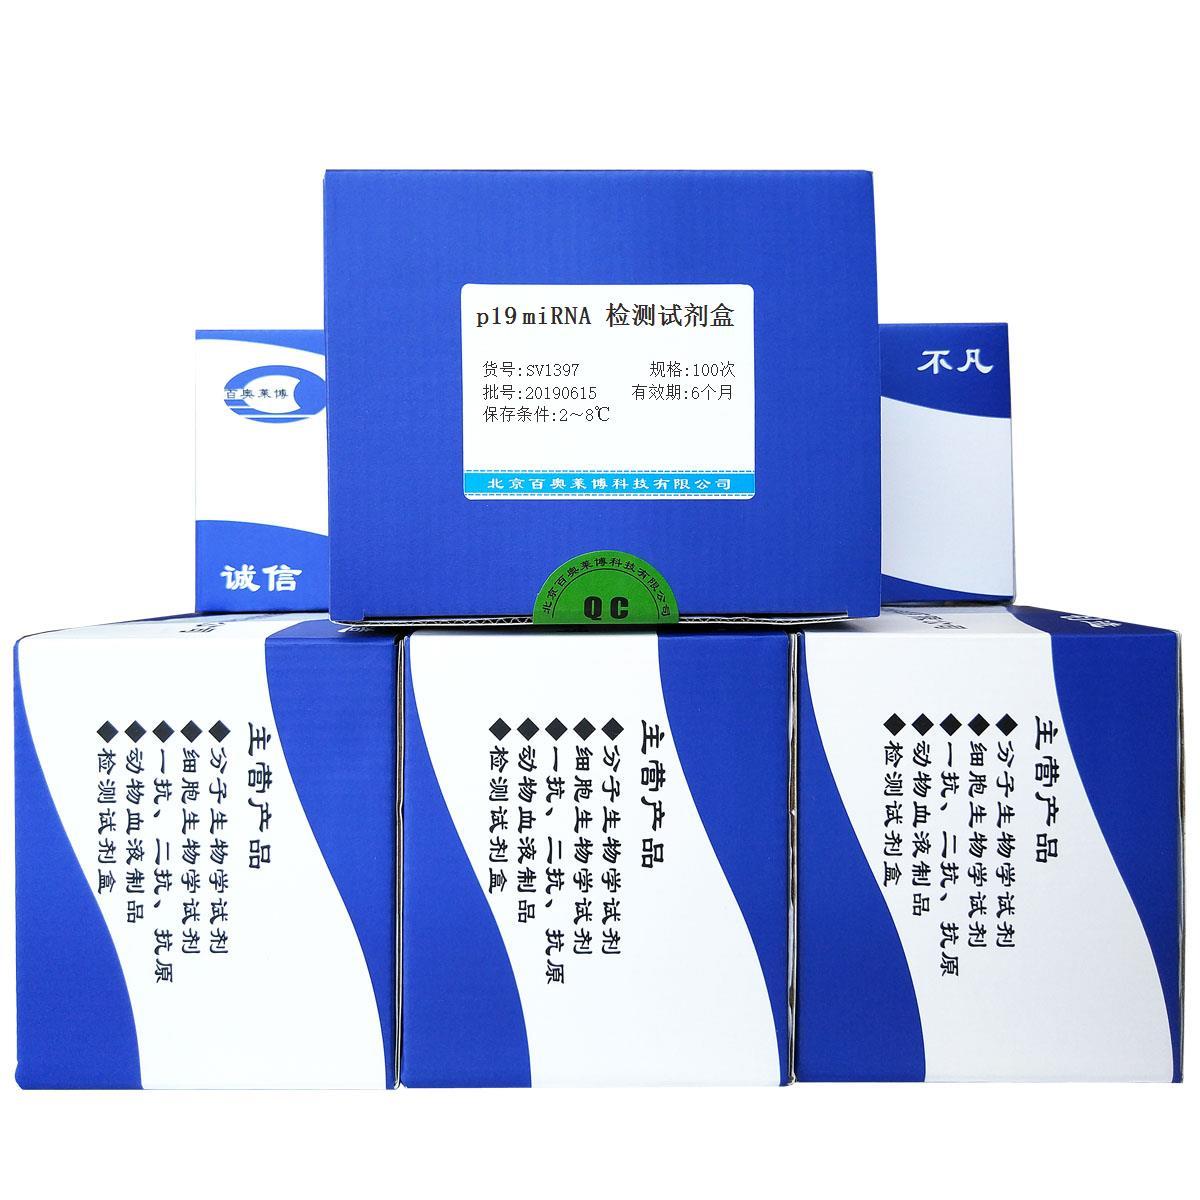 p19 miRNA 检测试剂盒北京价格